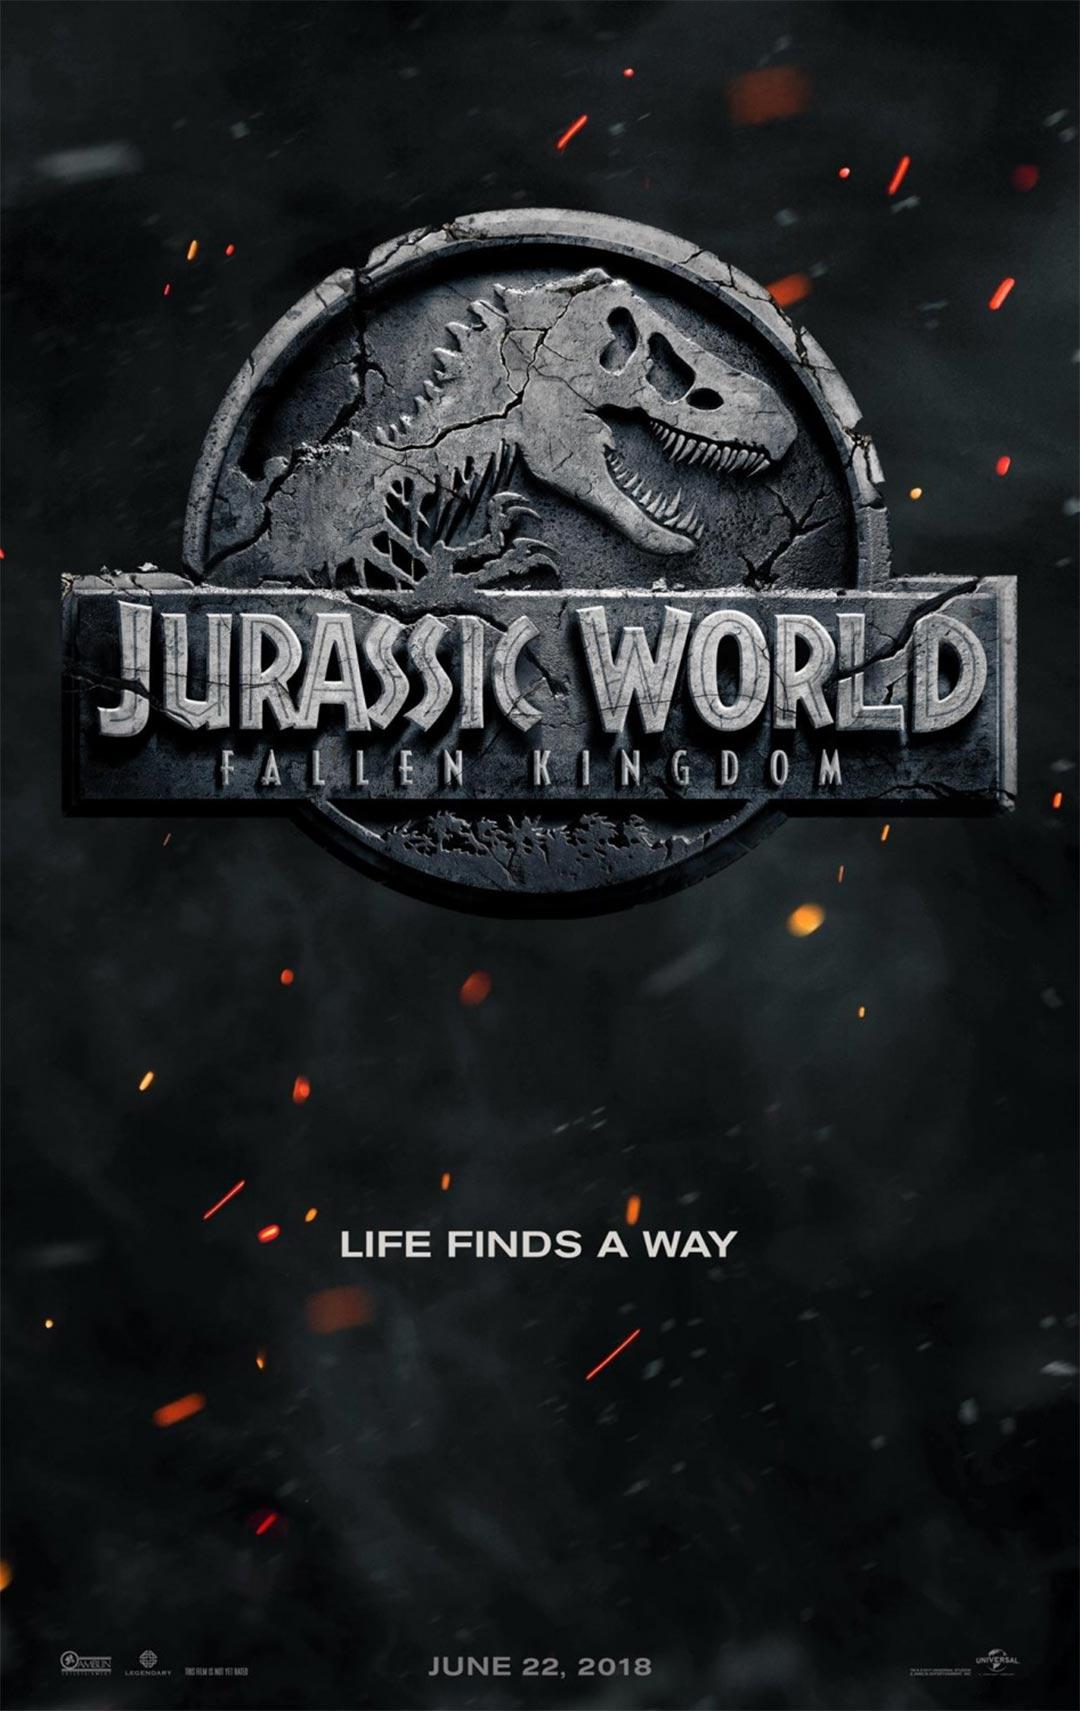 Jurassic World: Fallen Kingdom Poster #1